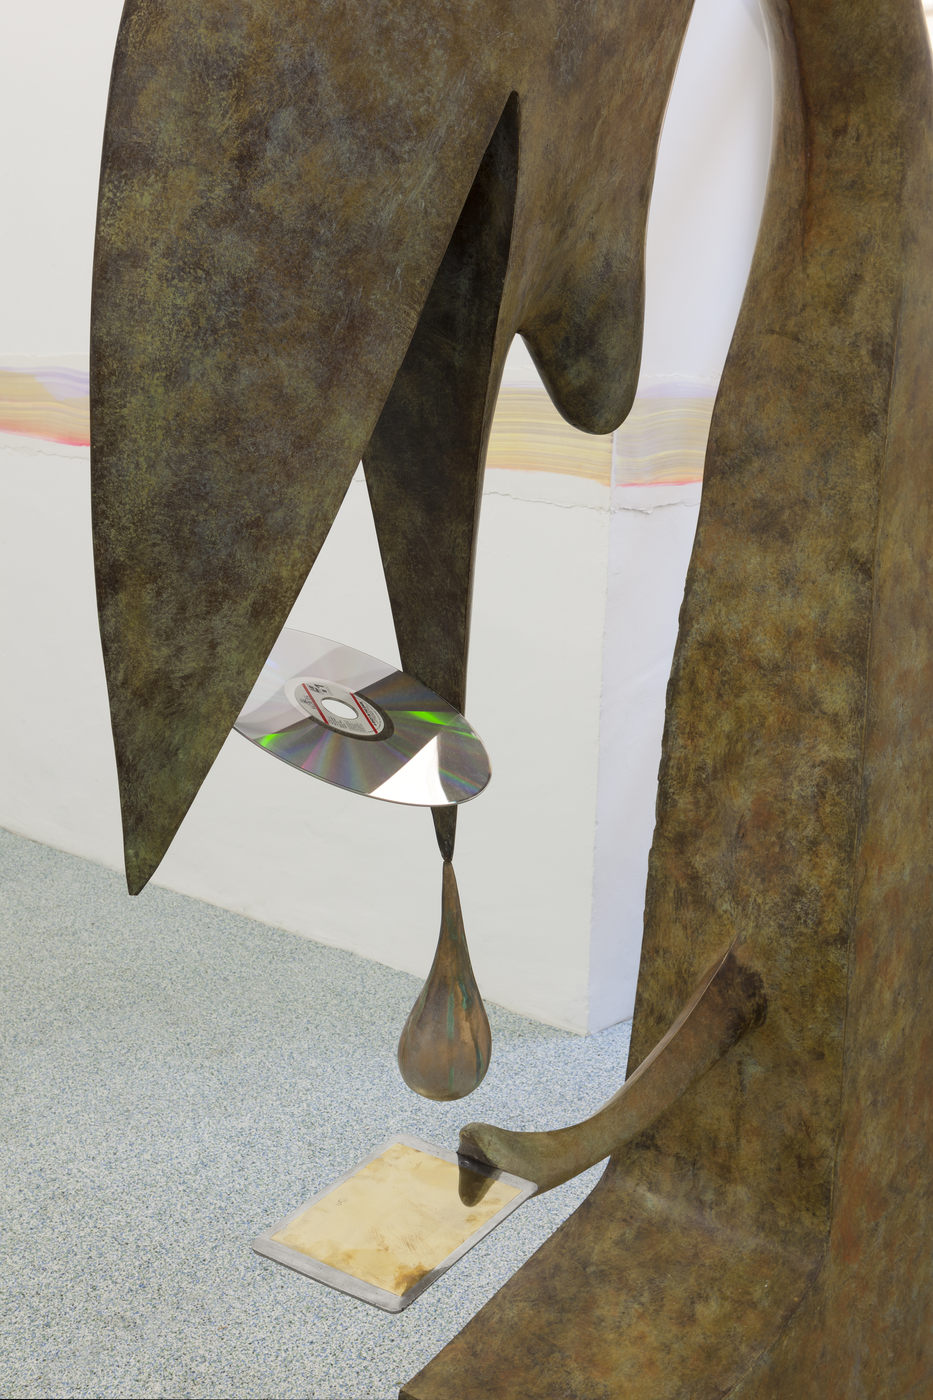 28. Camille Henrot, No Message. Bronze, aluminium, laser disk. Detail,2016